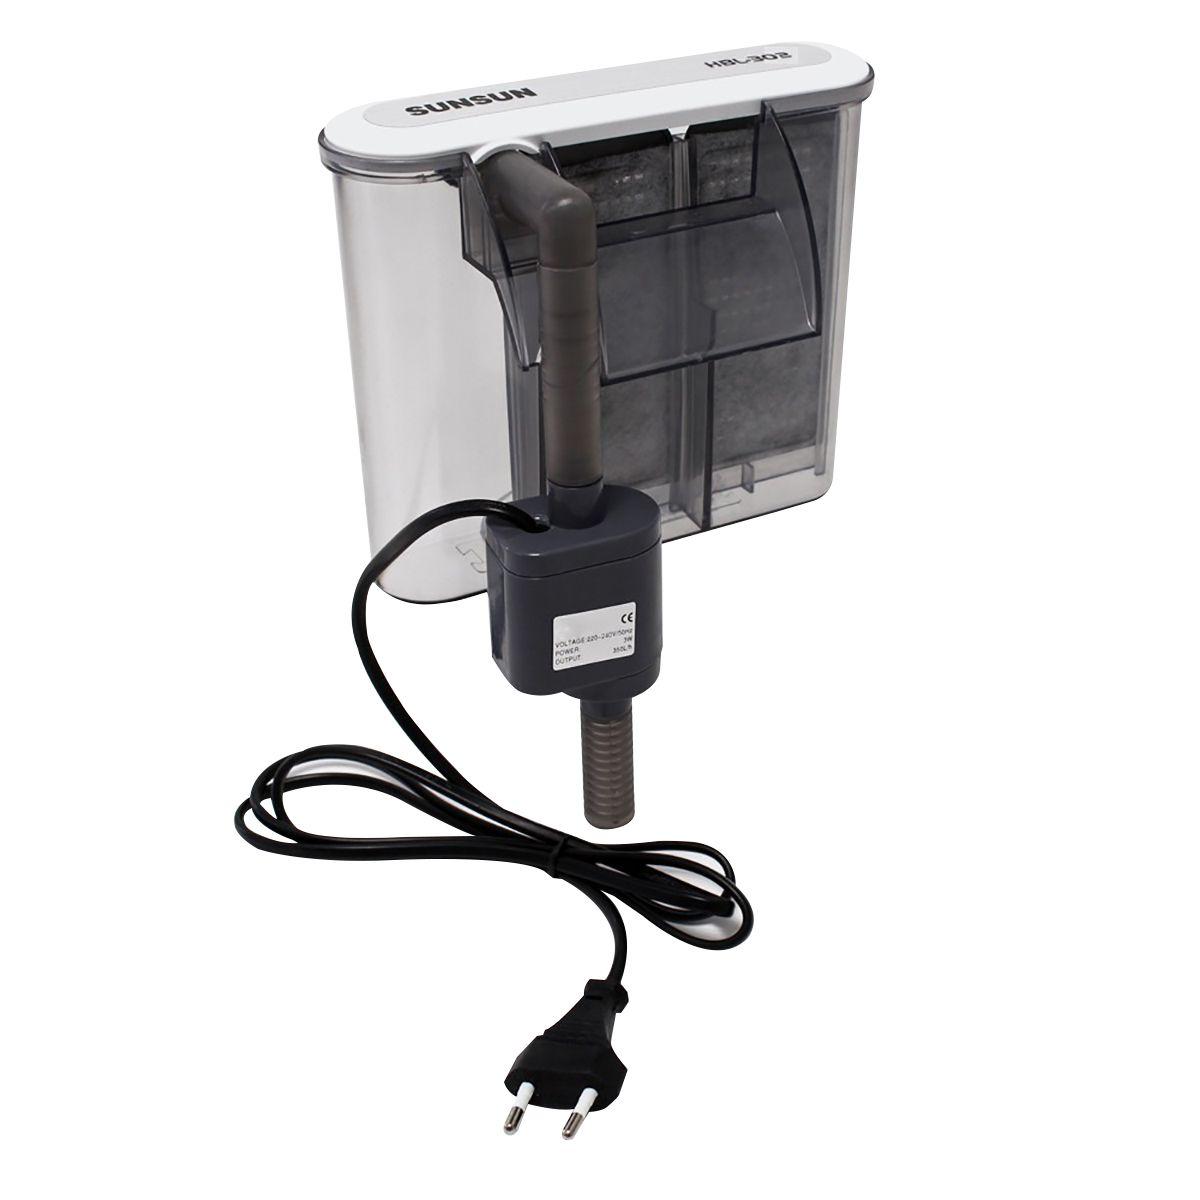 Filtro Externo Sunsun HBL-302 350 L/h Para Aquários